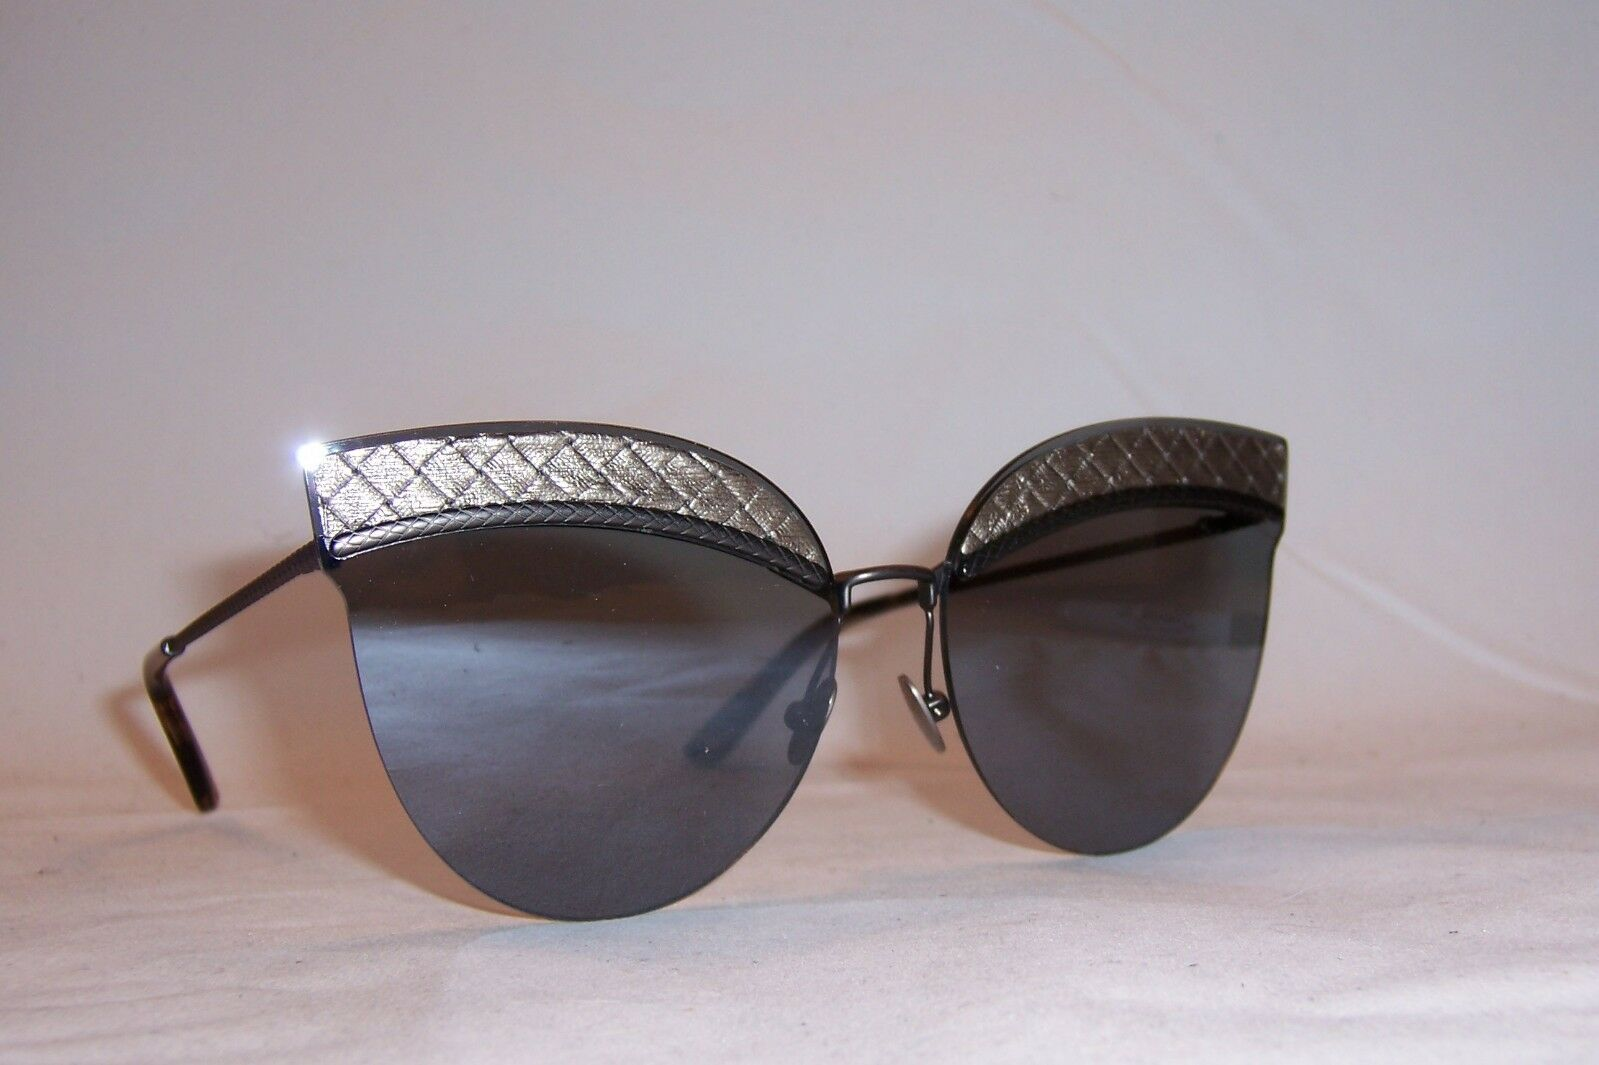 422c5a66cd462 BOTTEGA Veneta Sunglasses BV 0101s 002 Silver silver Mirror ...